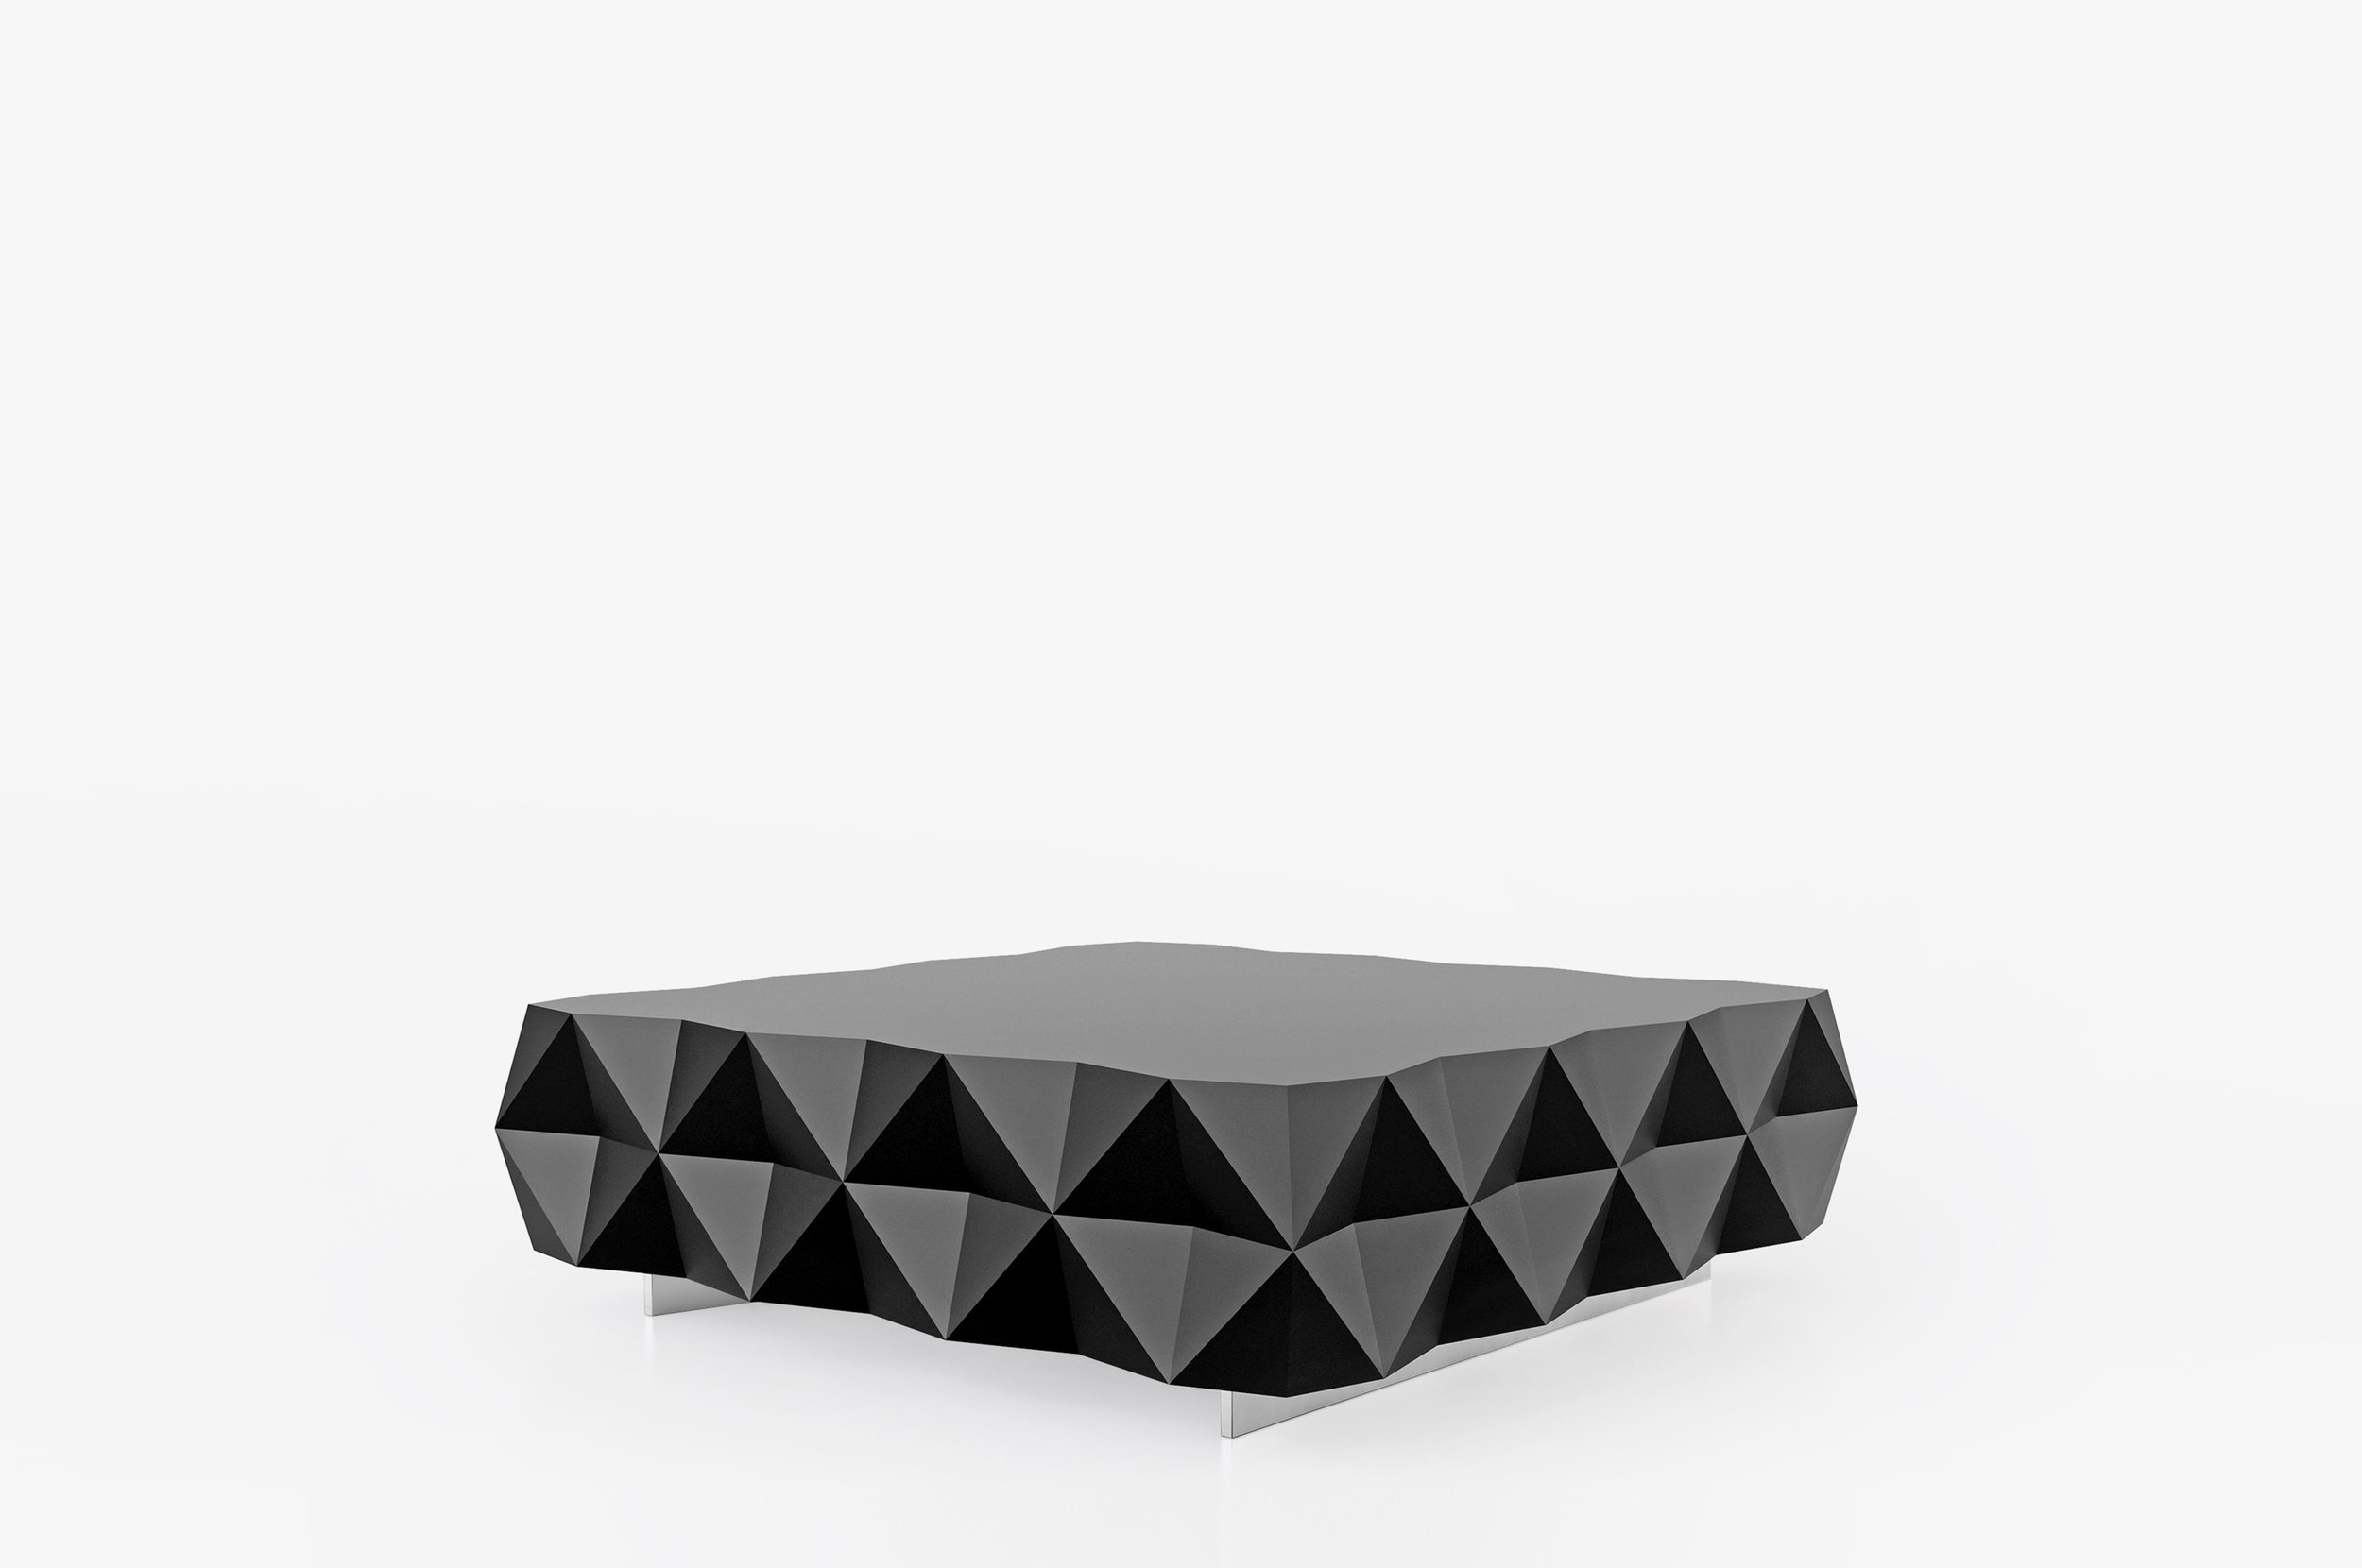 Rocky Table negra_FONDO BLANCO .jpg